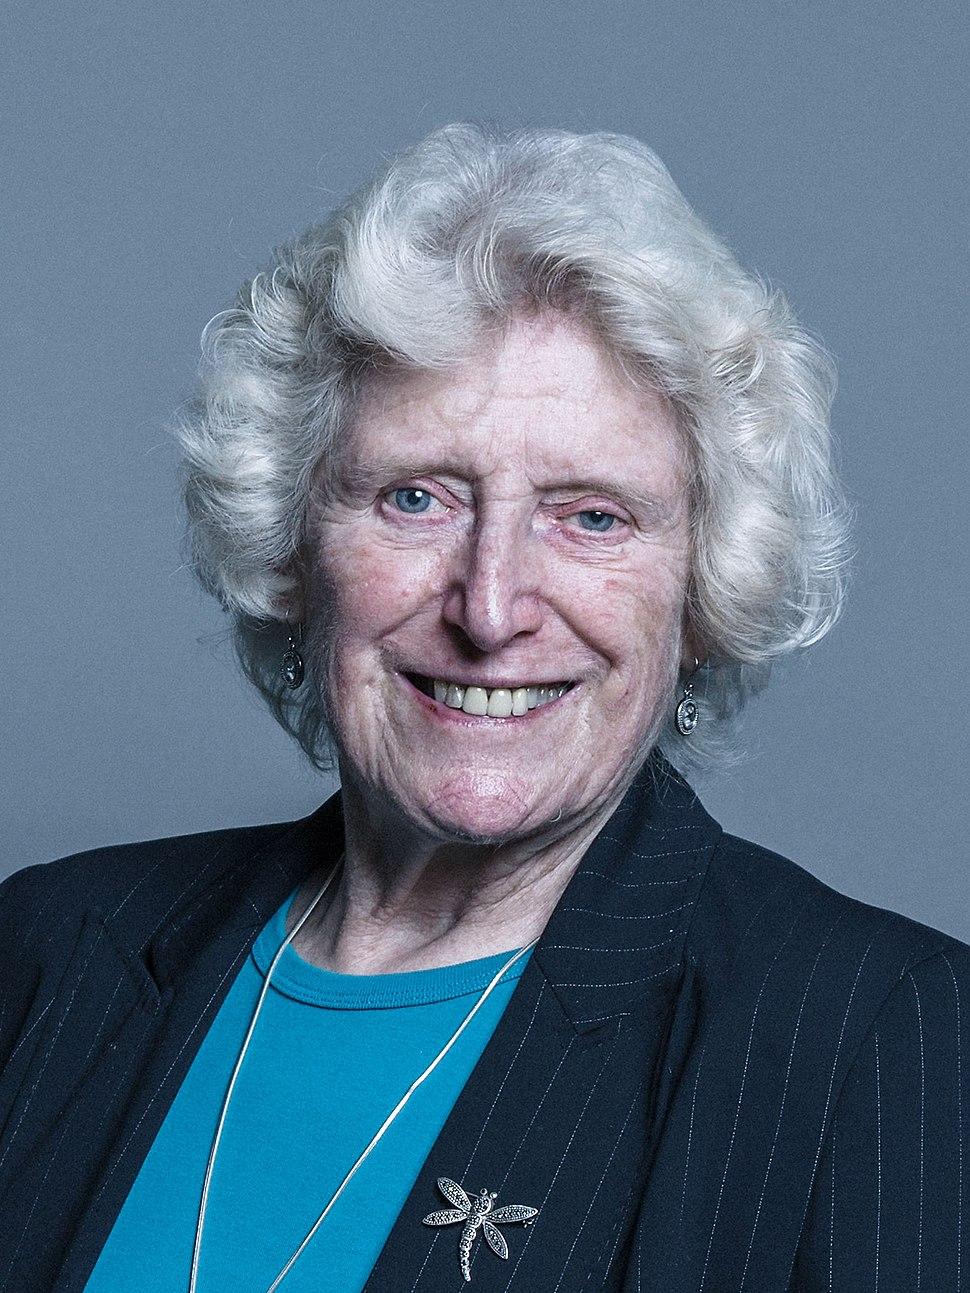 Official portrait of Baroness Butler-Sloss crop 2